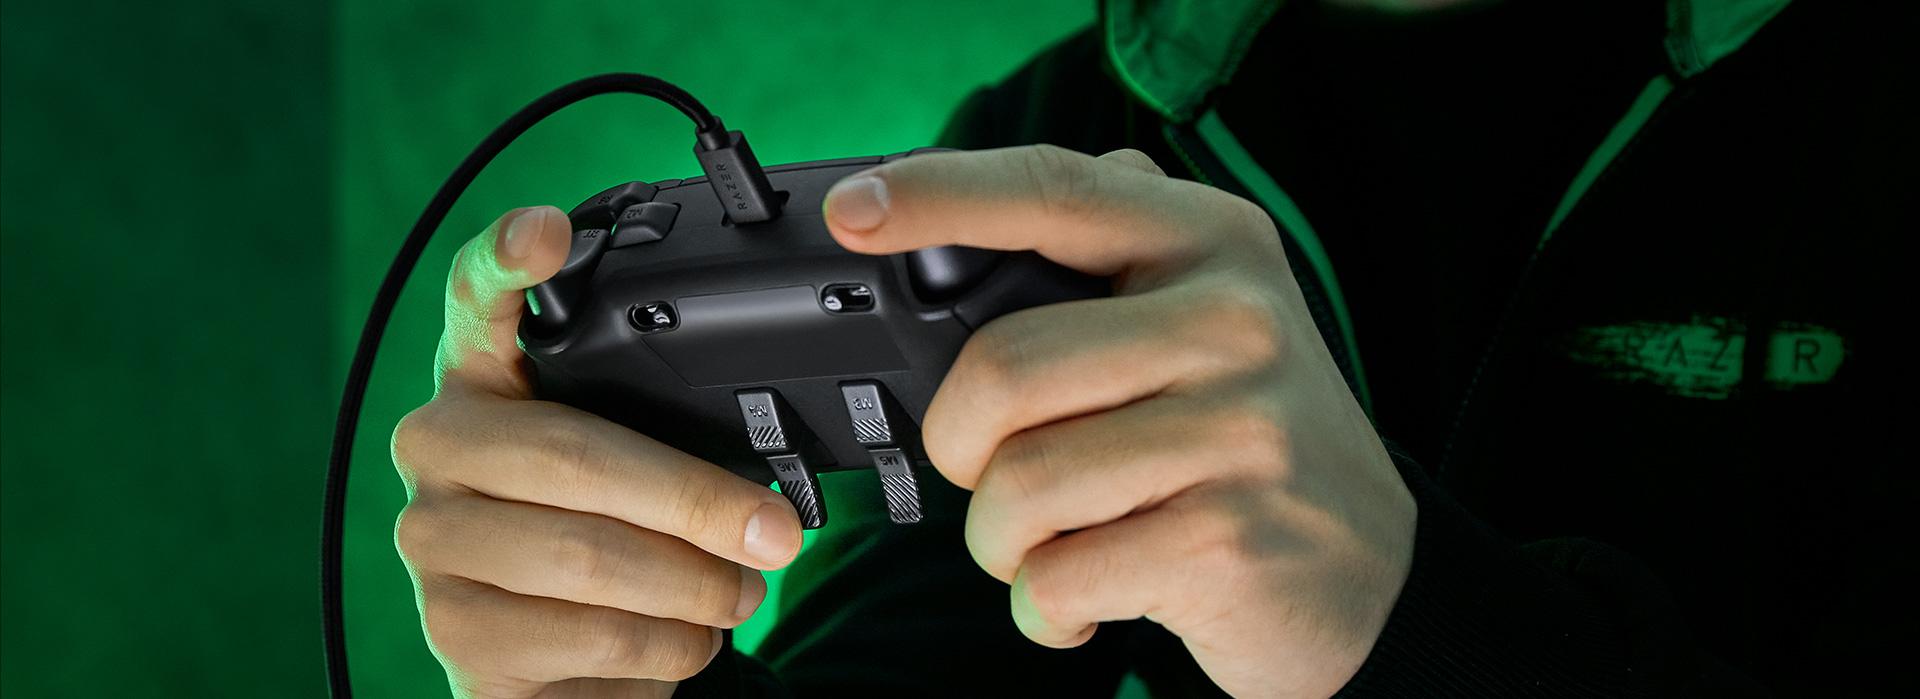 Xbox Series X|S Controller - Razer Wolverine V2 Chroma